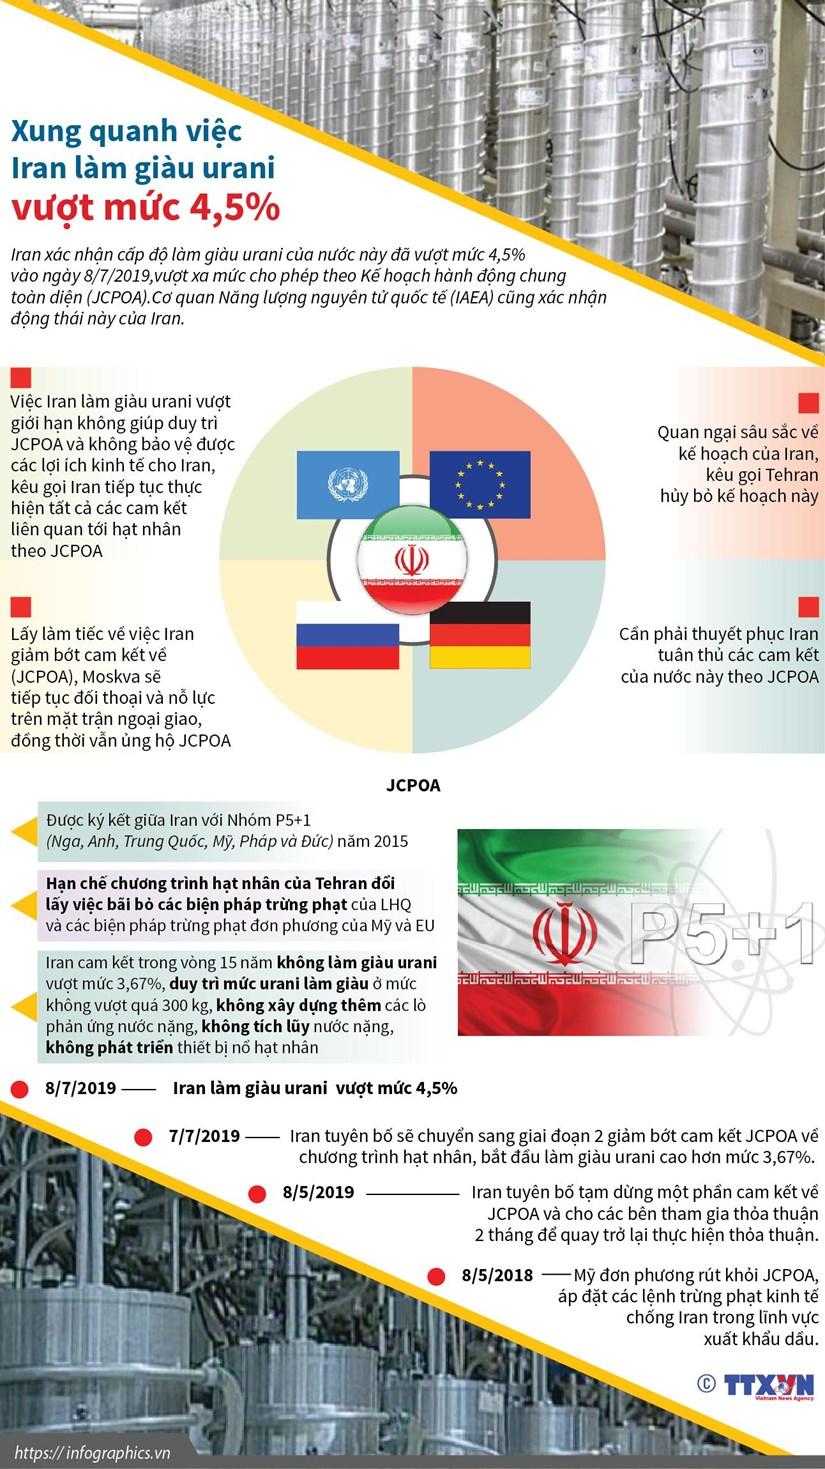 [Infographics] Xung quanh viec Iran lam giau urani vuot muc 4,5% hinh anh 1